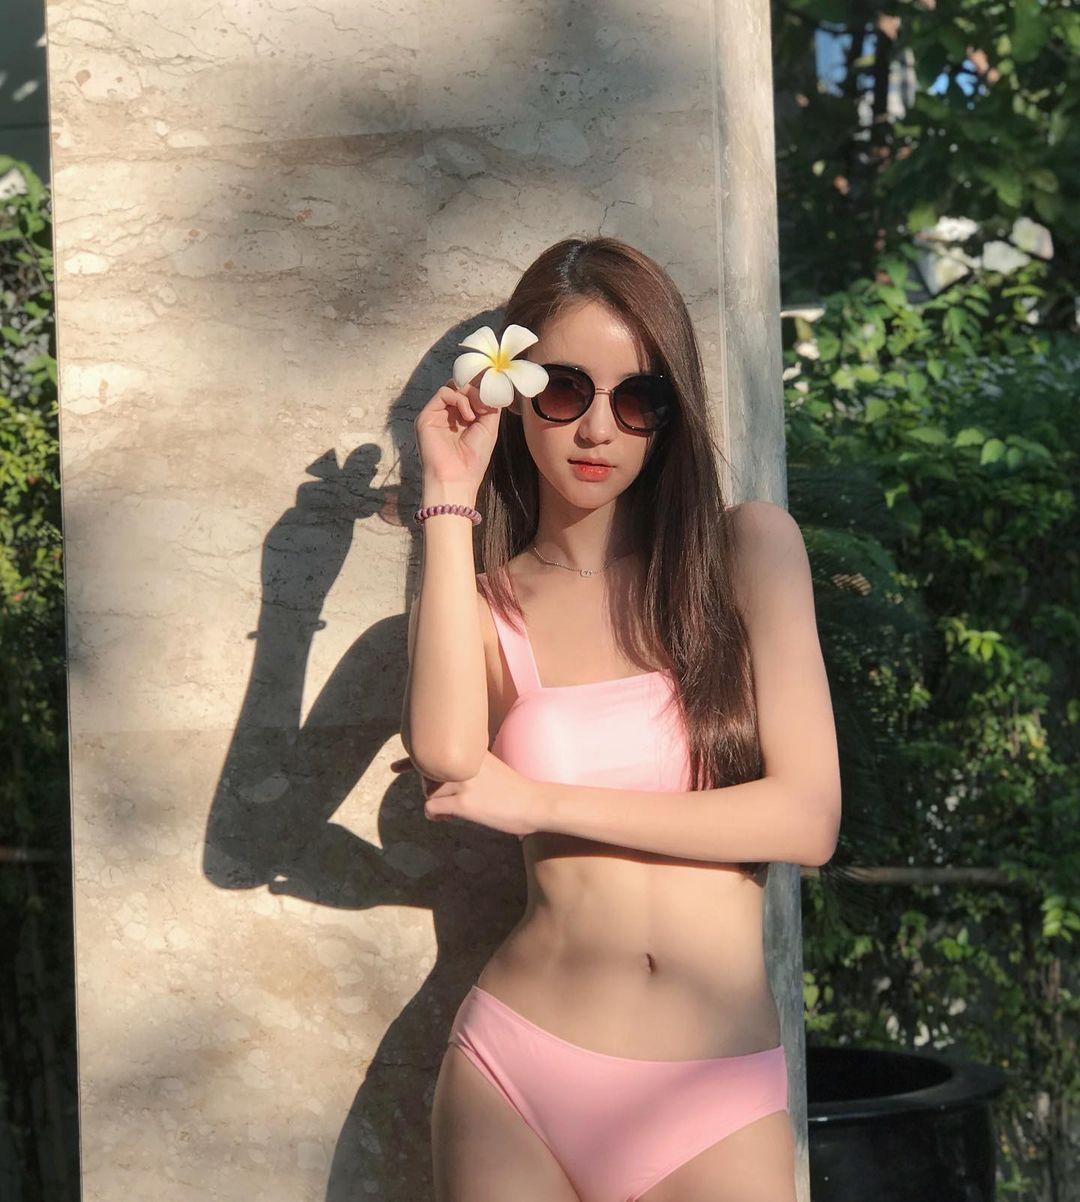 Gaya SeksiYoshi Rinrada, Transgender Thailand yang Bikin Salfok